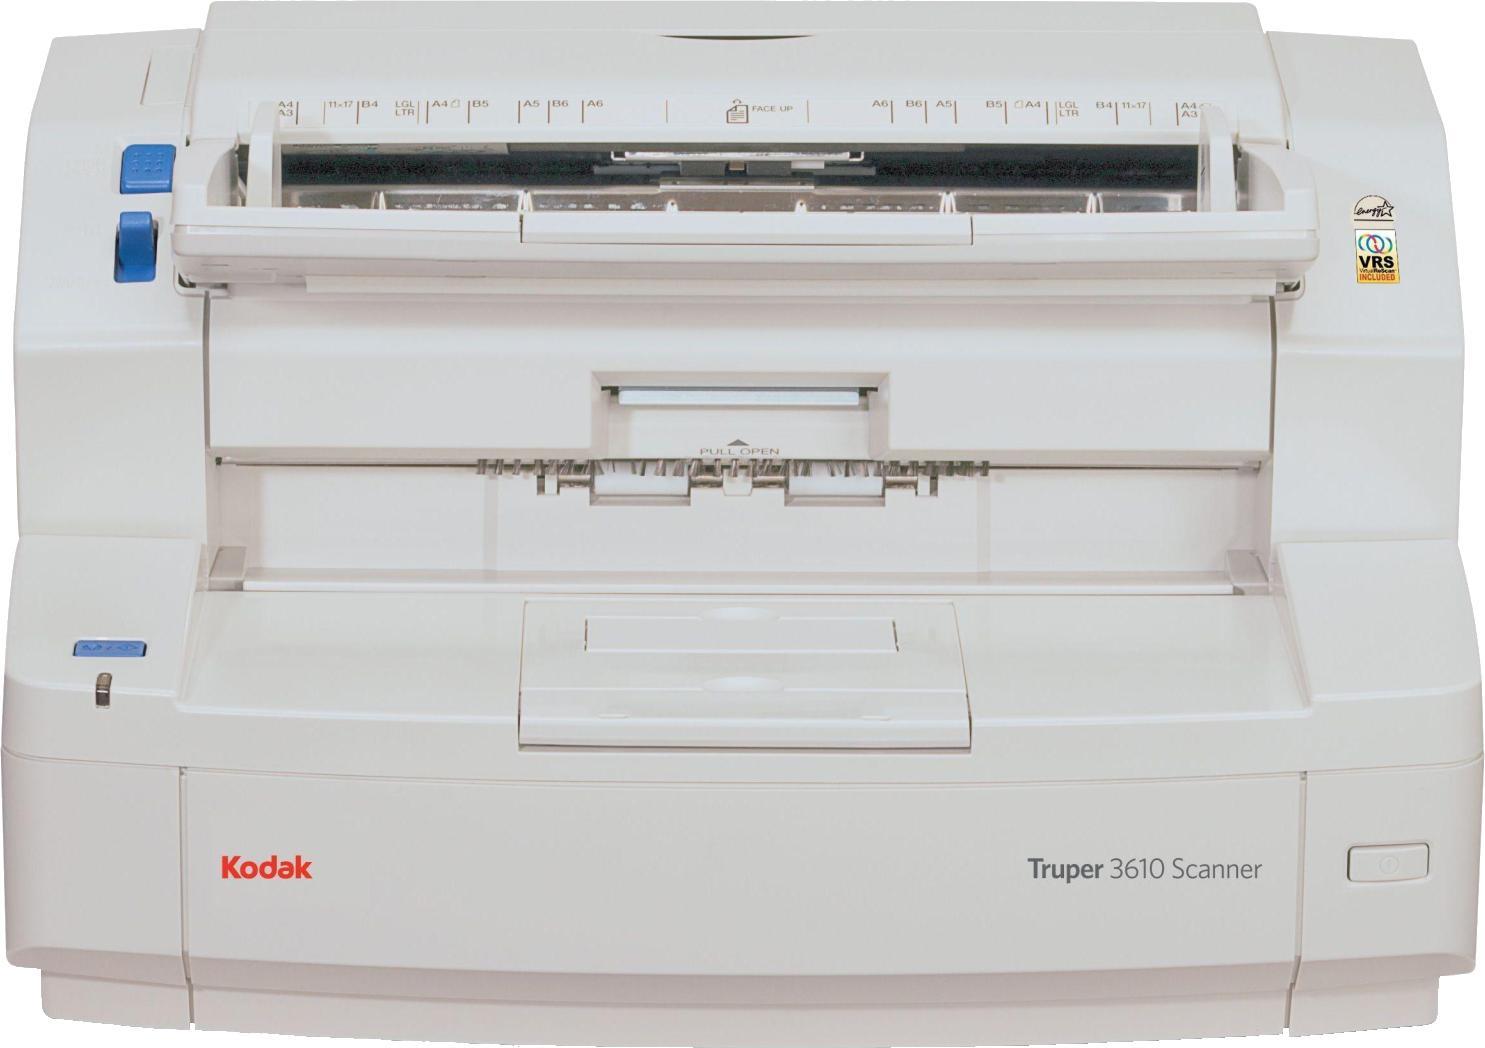 Kodak Rotary Scanner